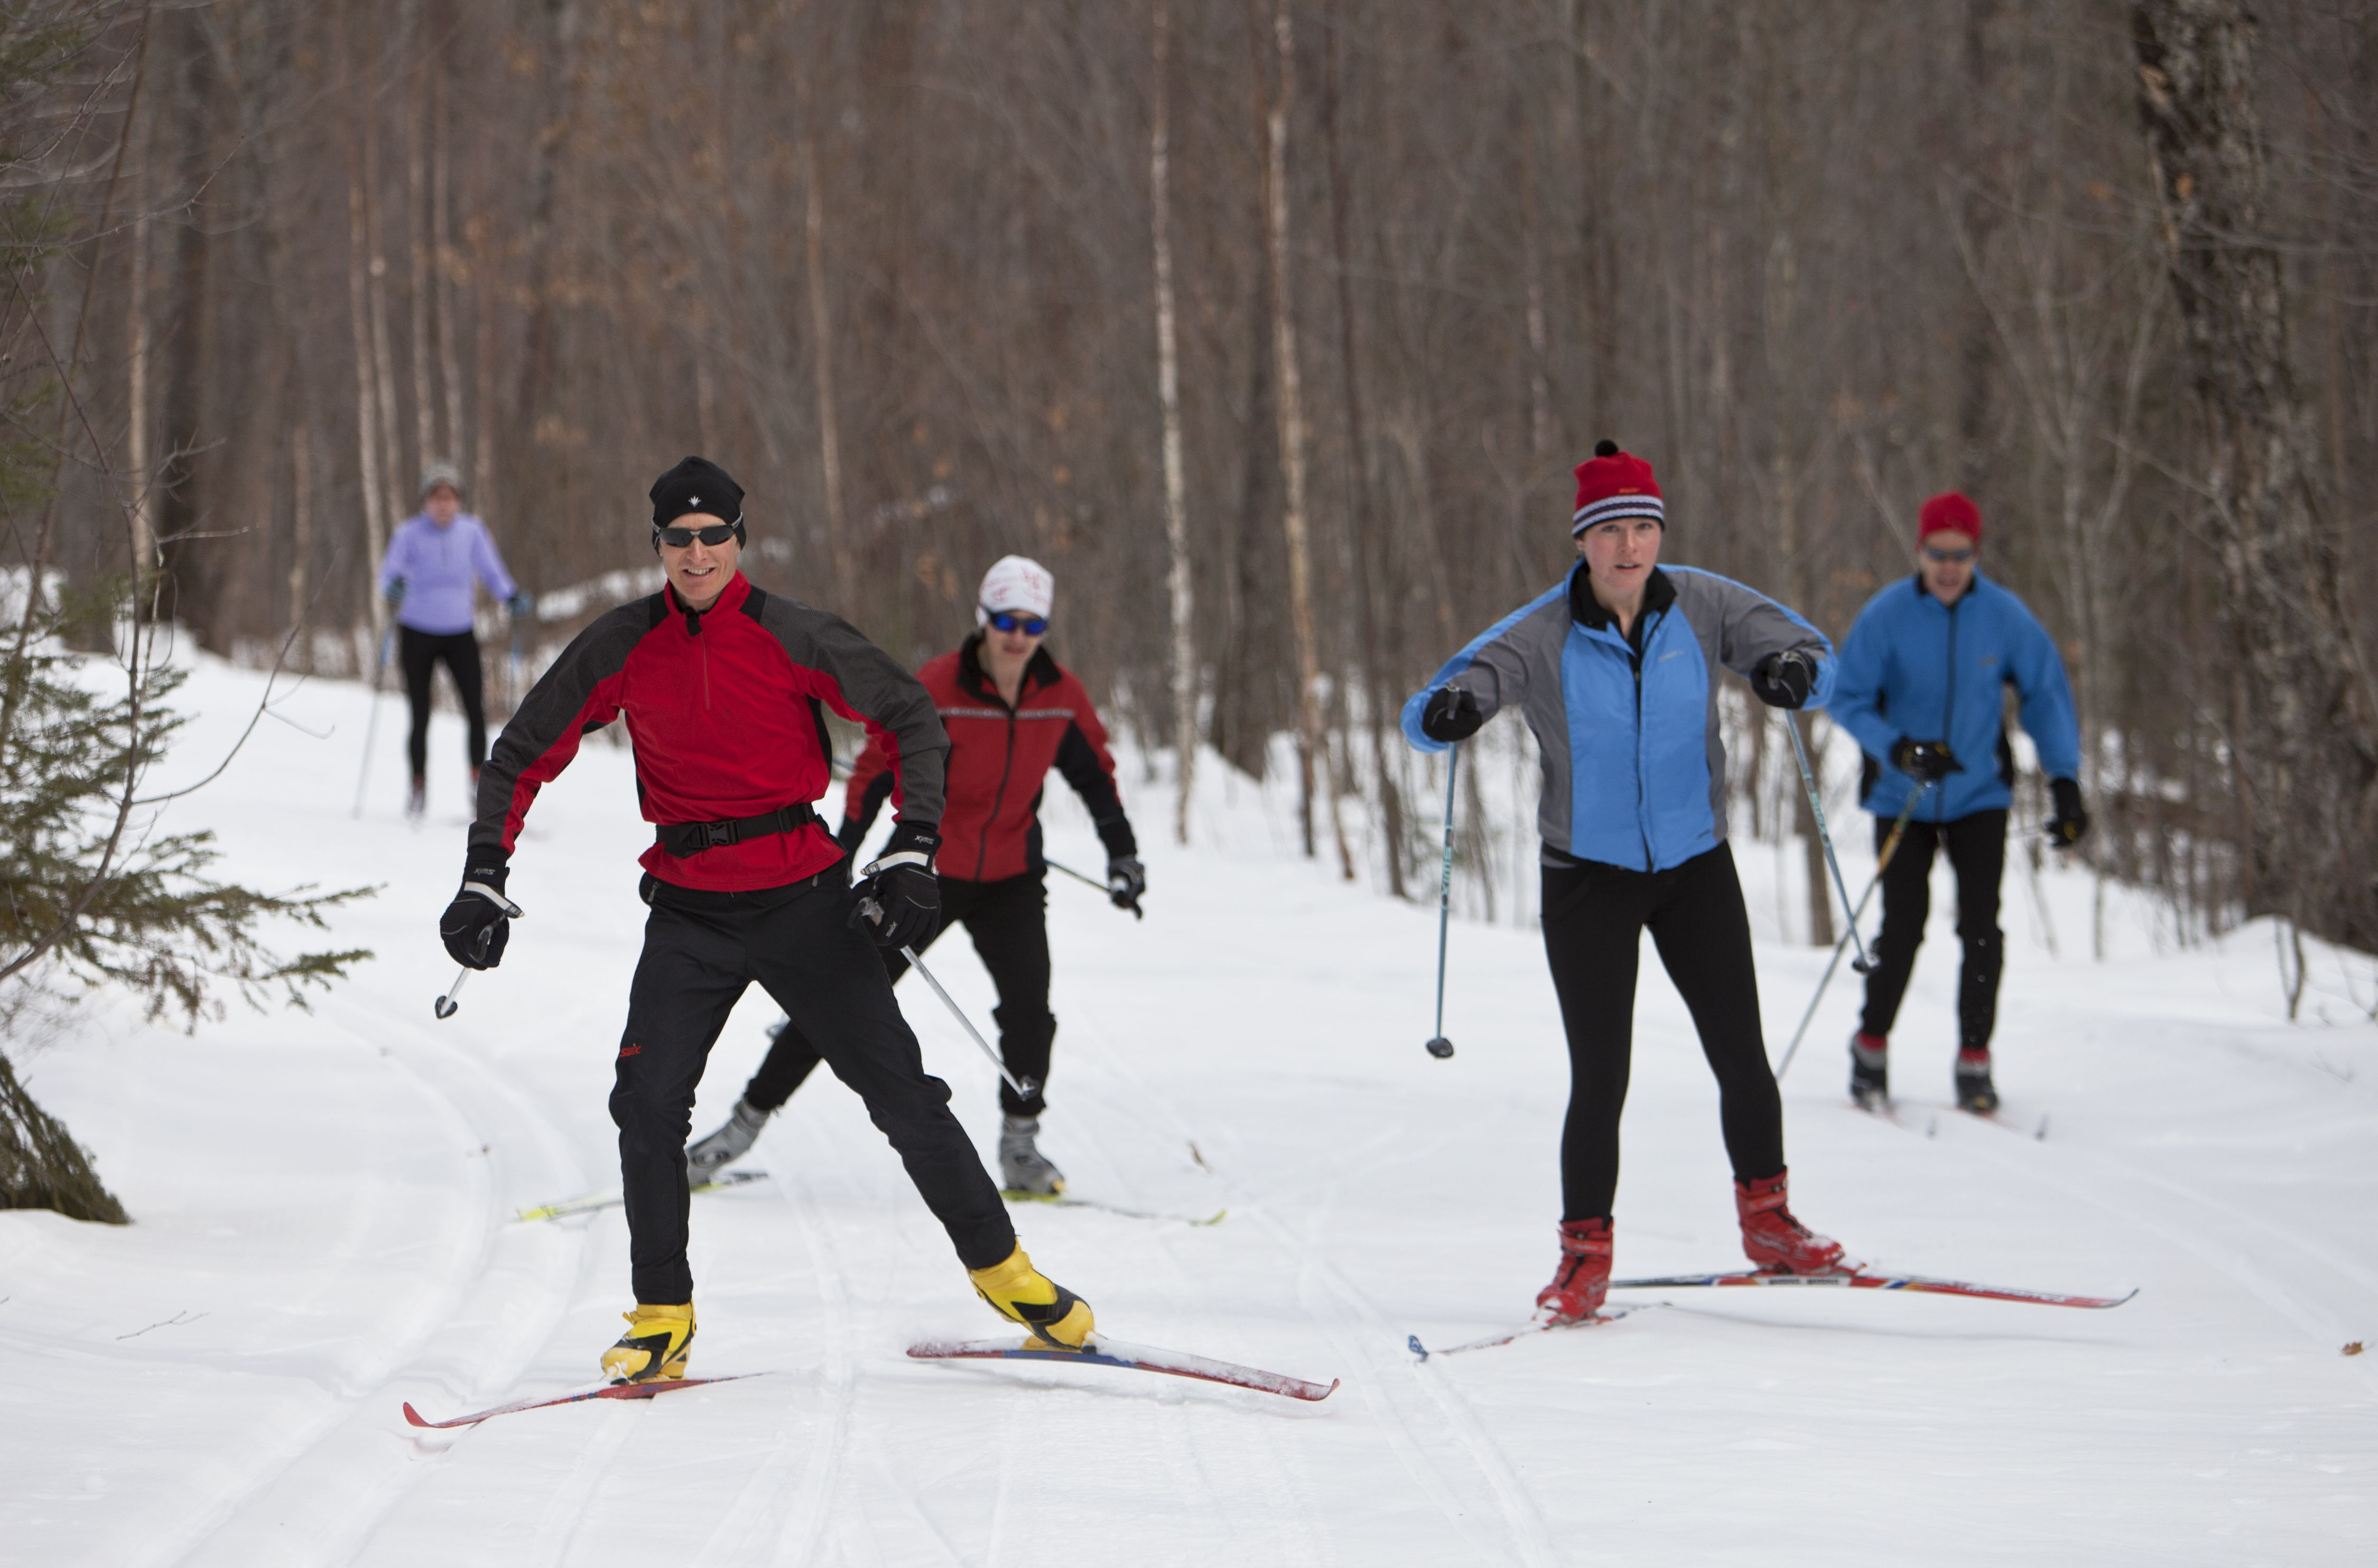 Cross Country Skiers Photo By Joe Michl Giantsridge Onlyinmn Cross Country Skier Snow Sports Cross Country Skiing